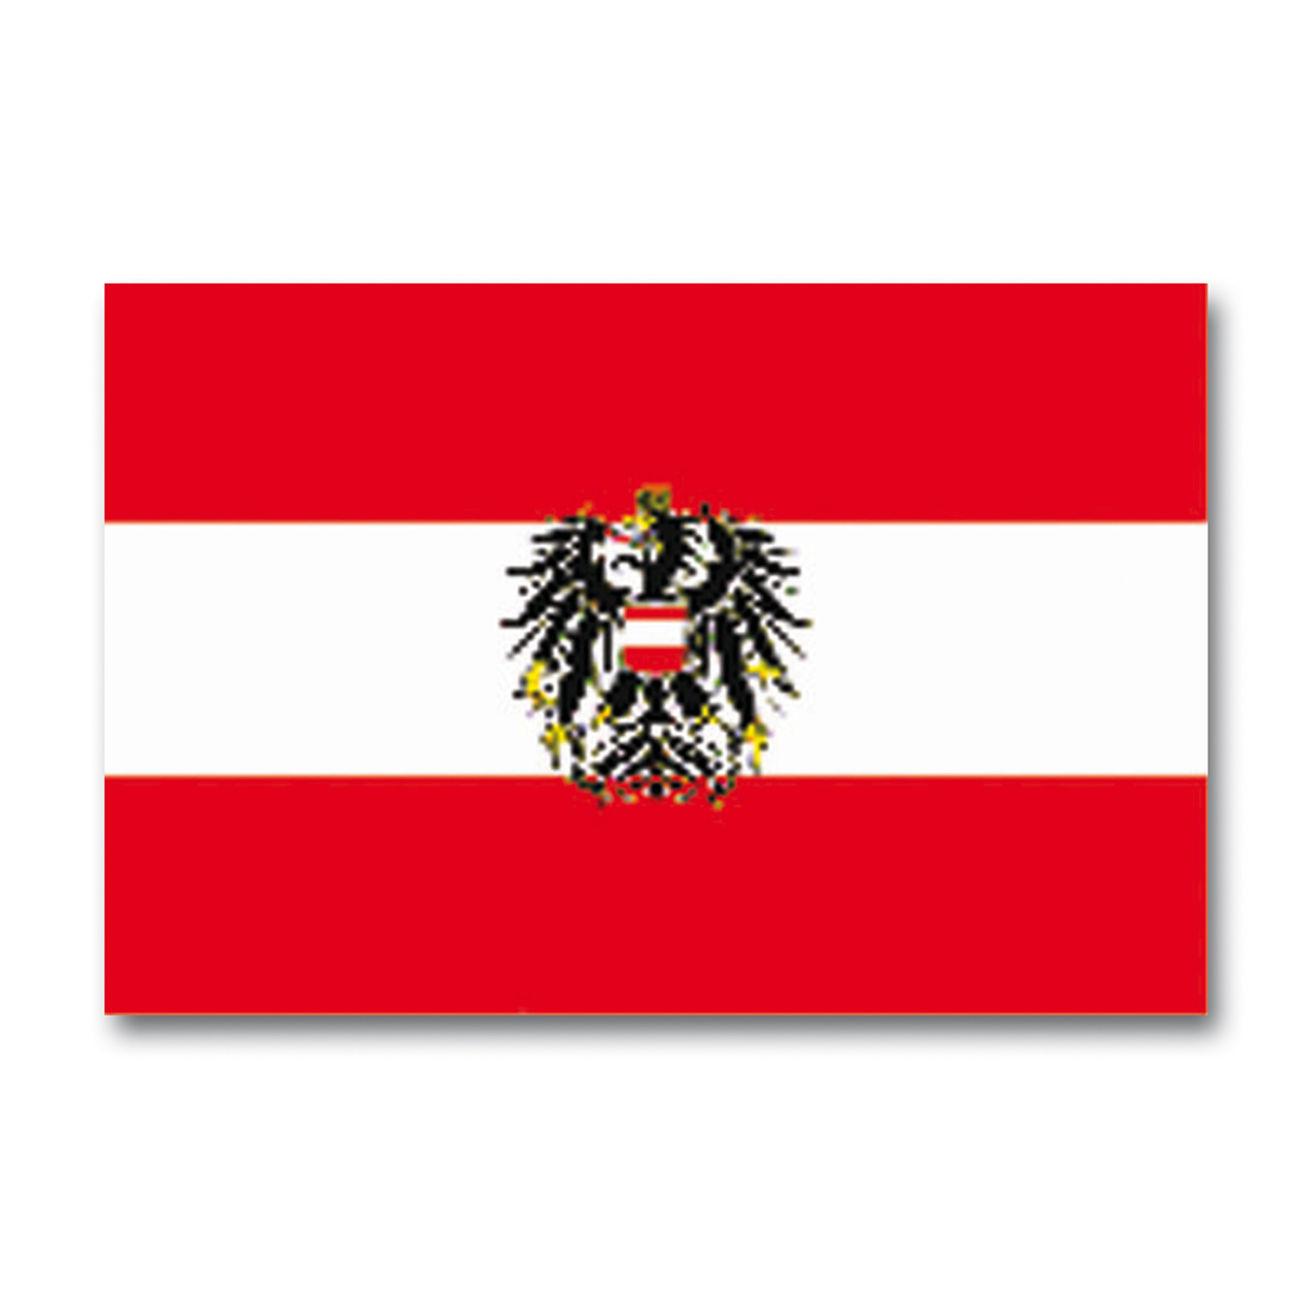 Austria Wallpaper Hd Flagge 214 Sterreich Kotte Amp Zeller